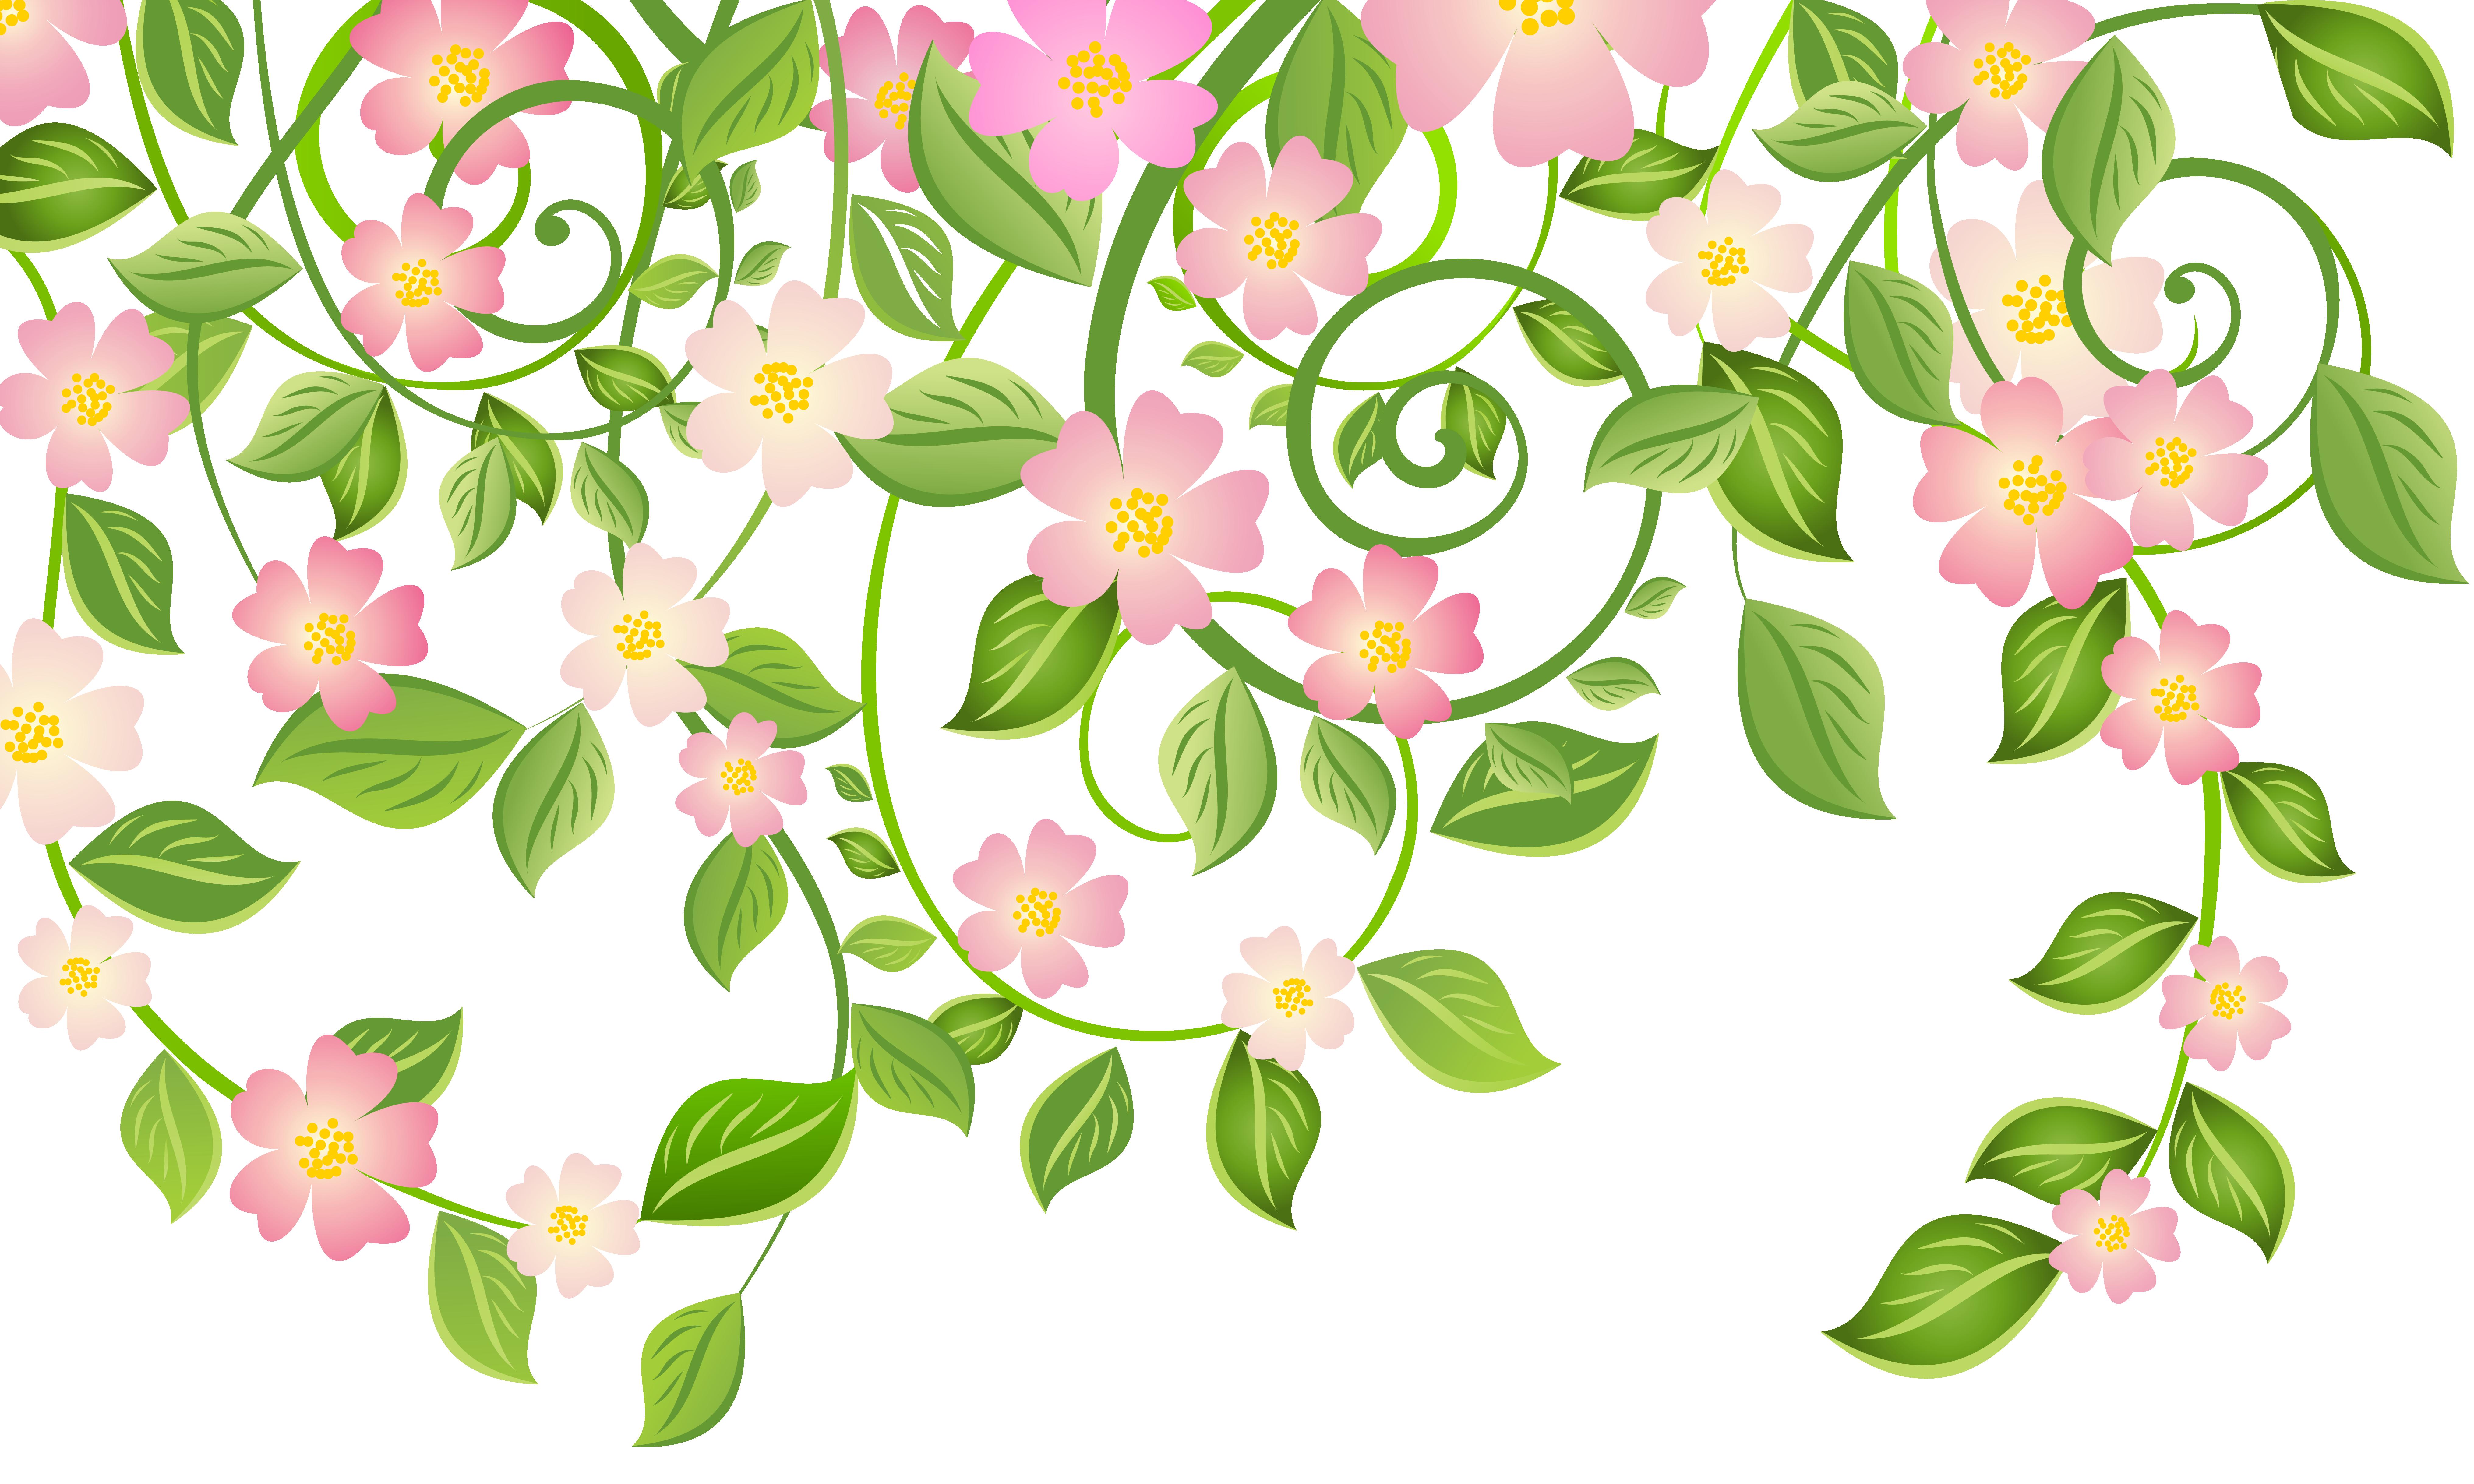 Flower garden clipart png freeuse Spring Flower Garden Clip Art - treknepal.asia png freeuse